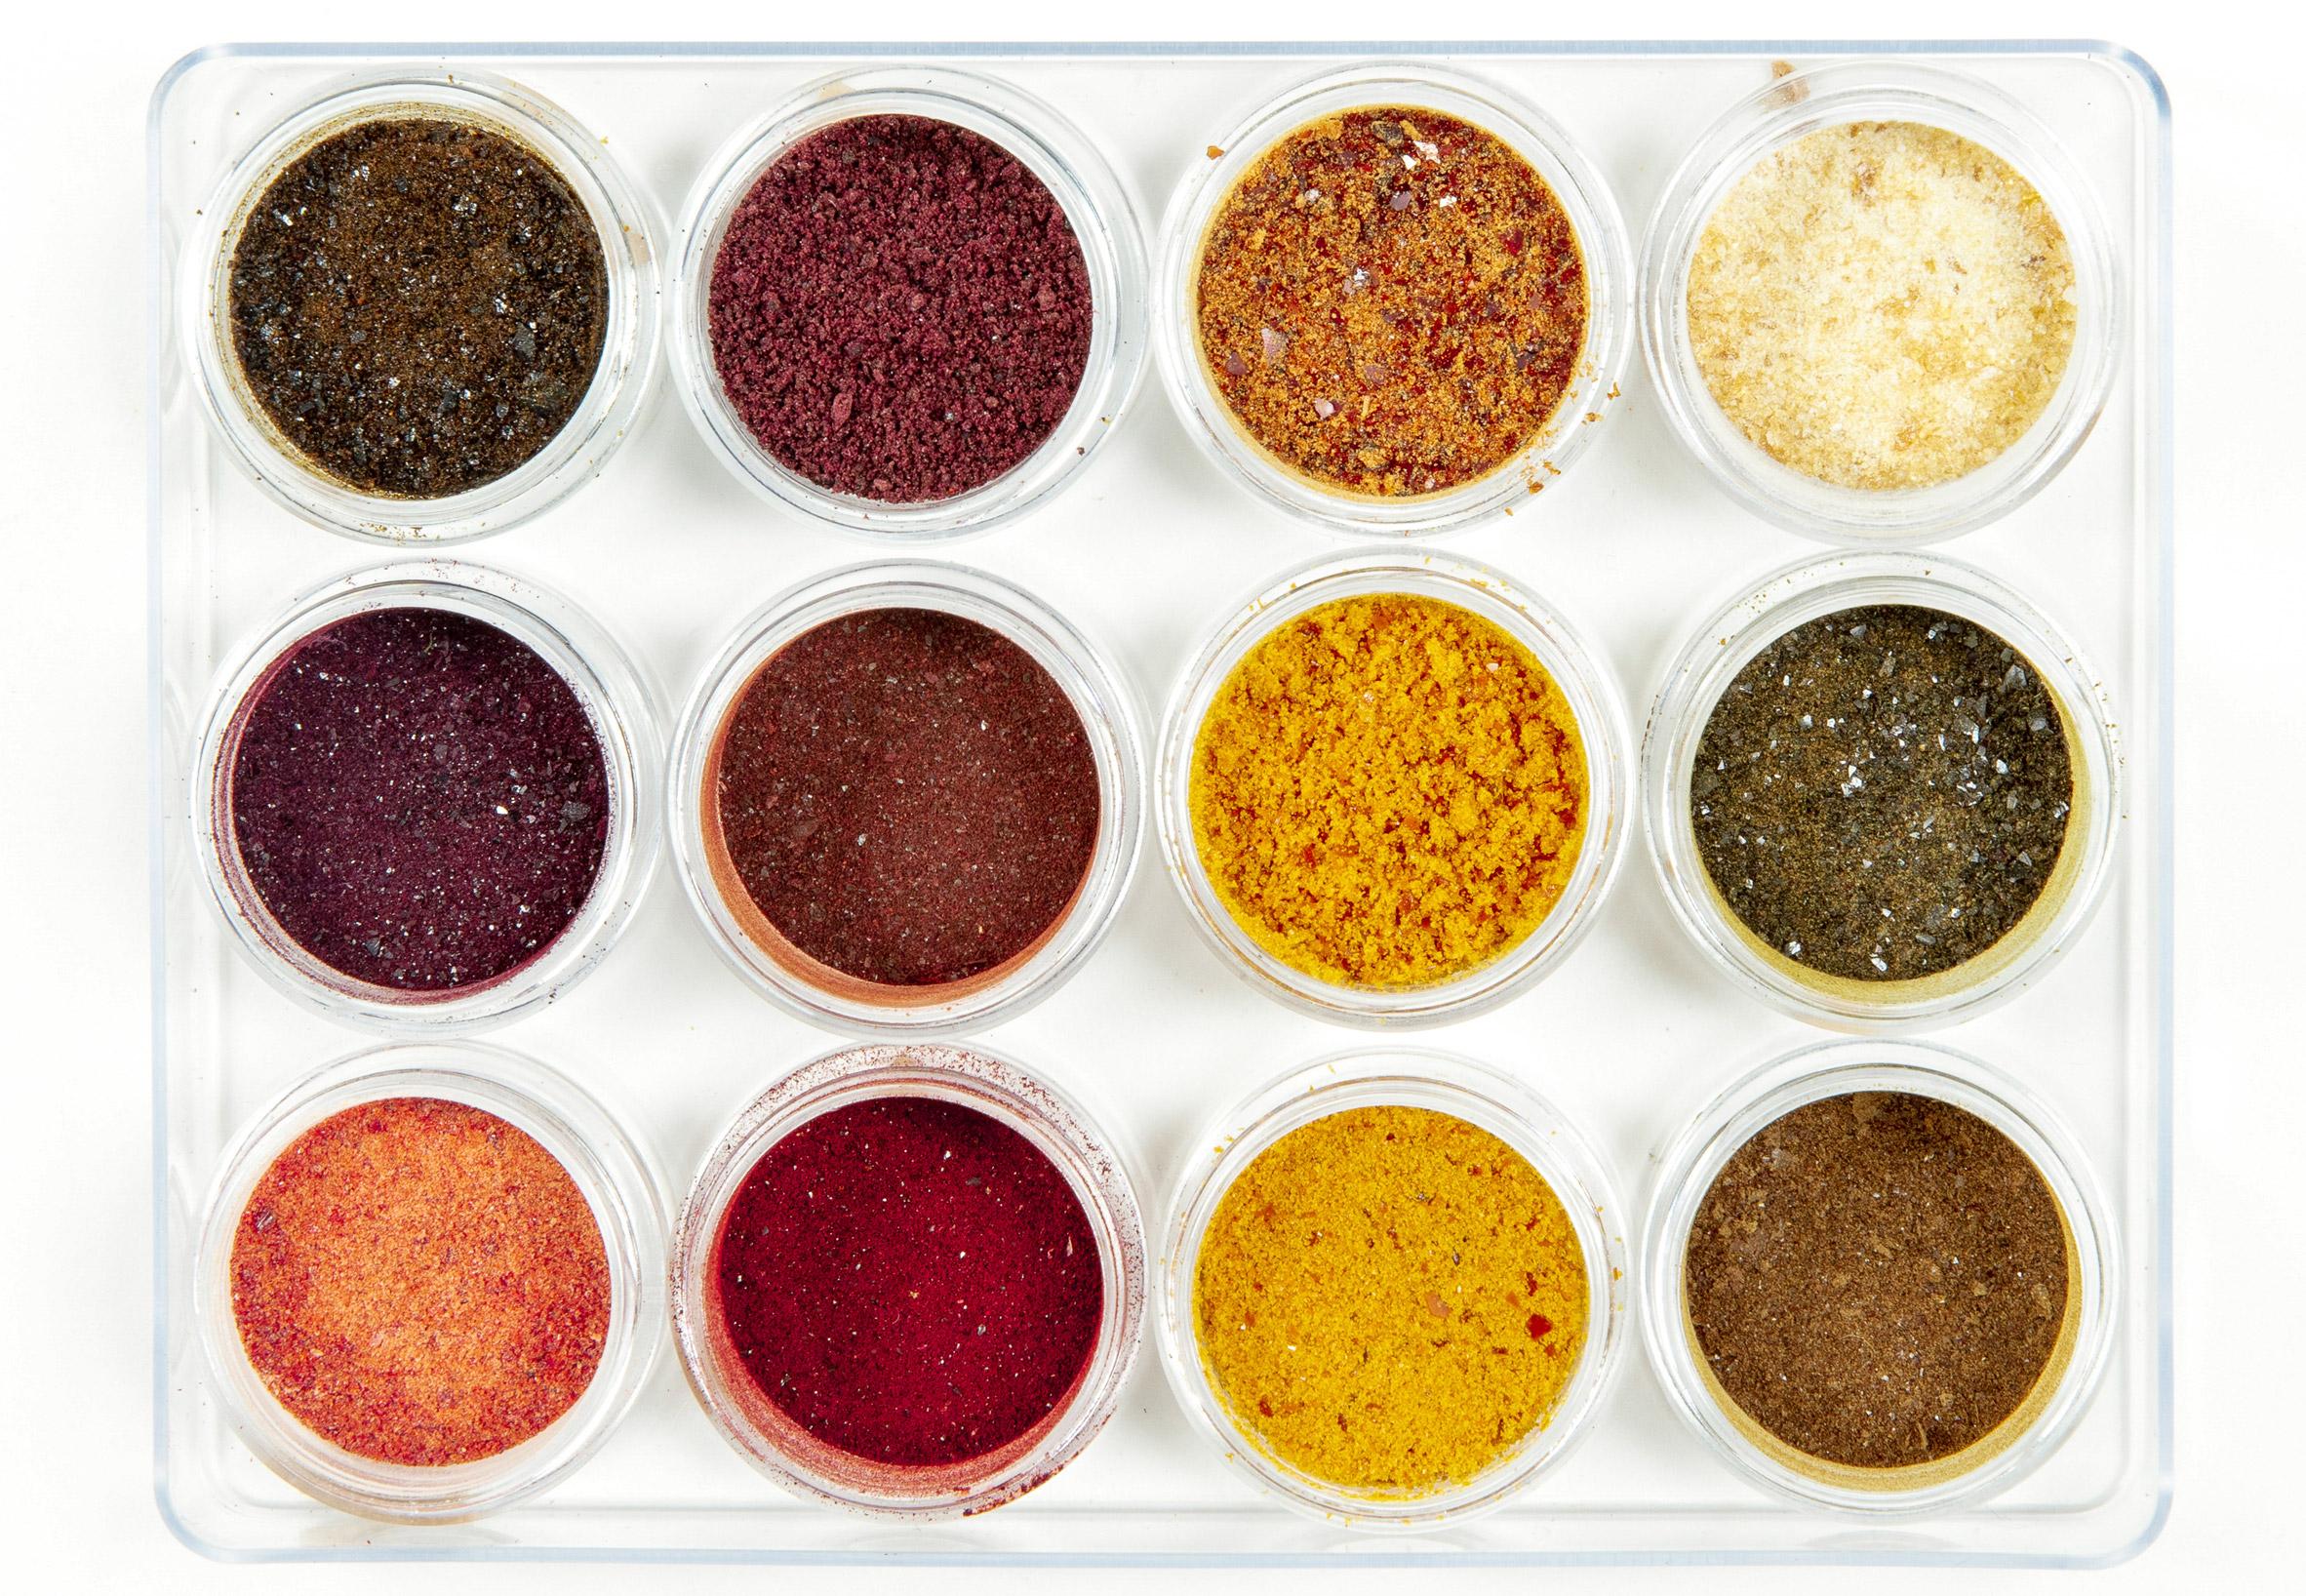 kaiku-nicole-stjernsward-imperial-college-graduate-project-2019-food-waste-vegeatable-skin-pigment_dezeen_2364_col_14.jpg